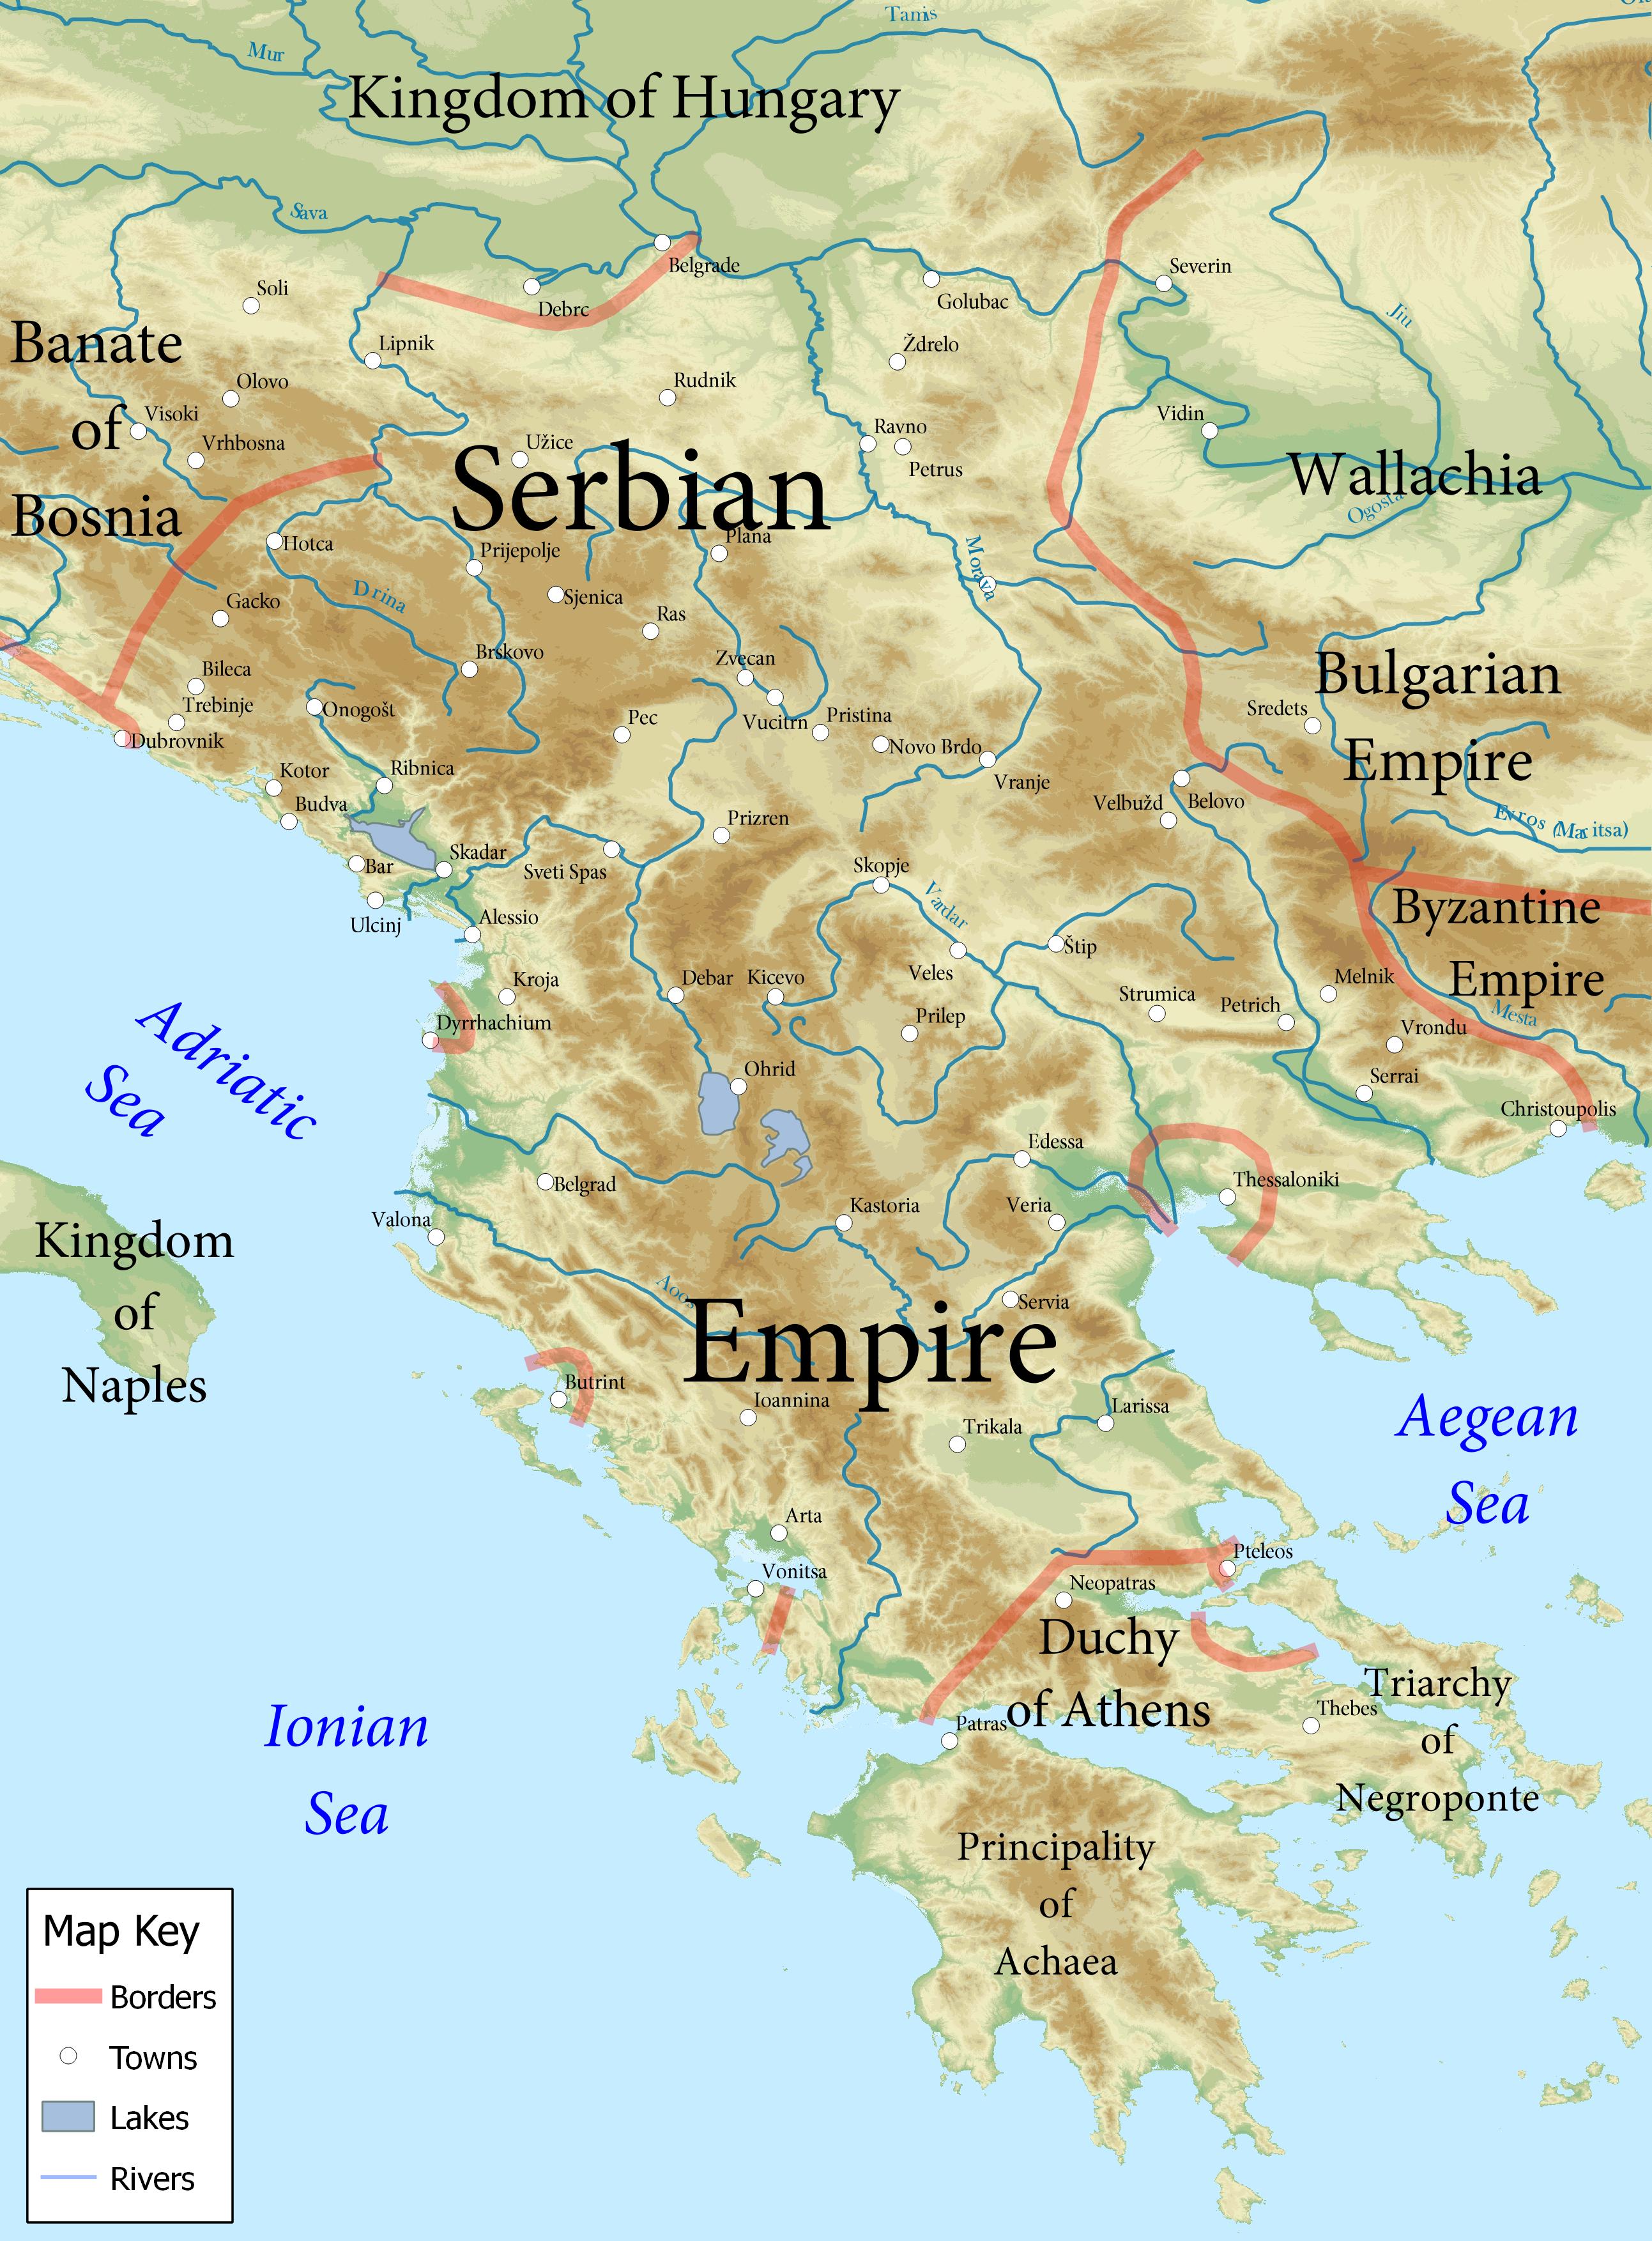 Serbian Empire